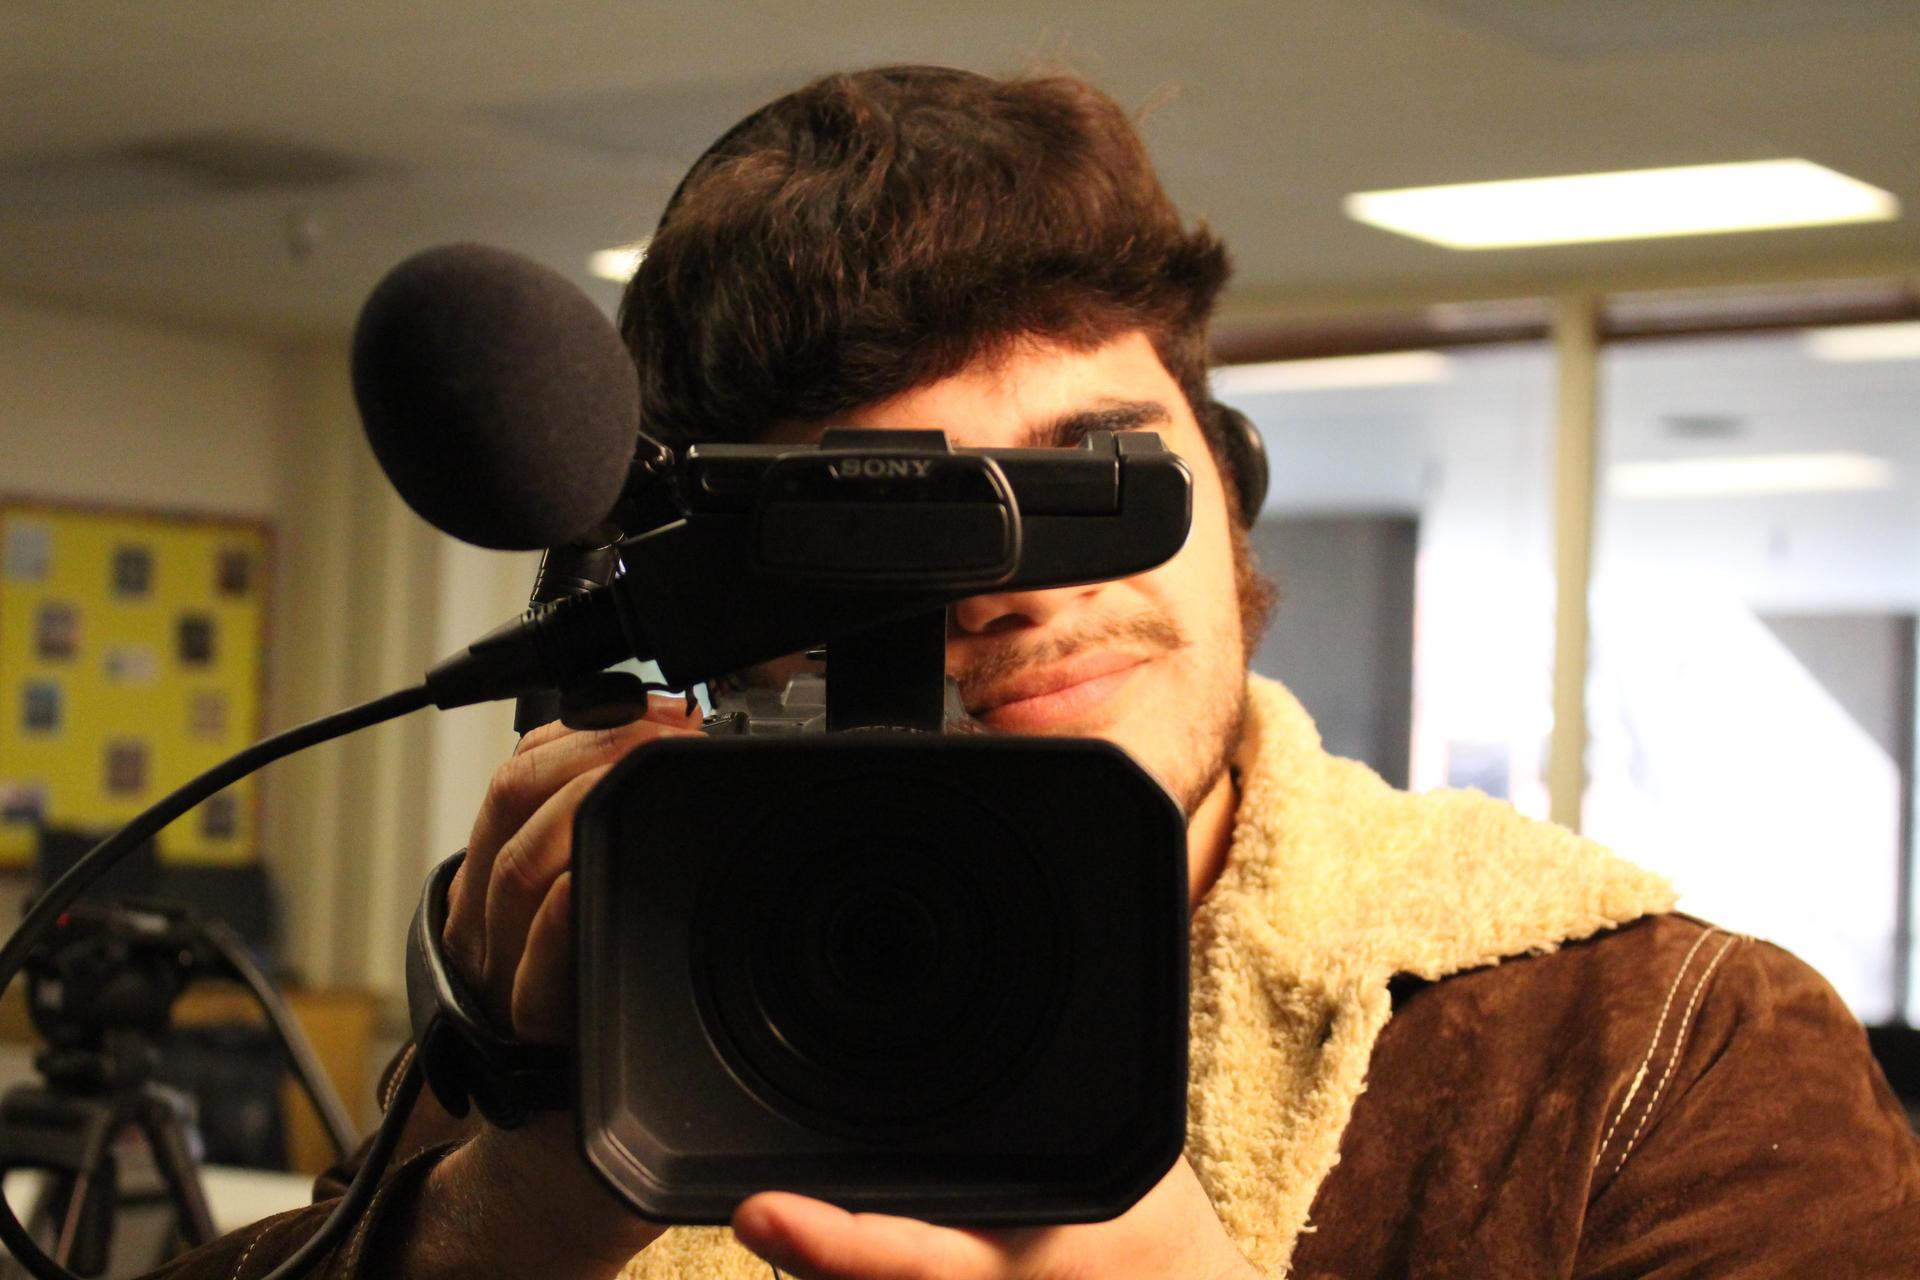 Camera use and videography skills!